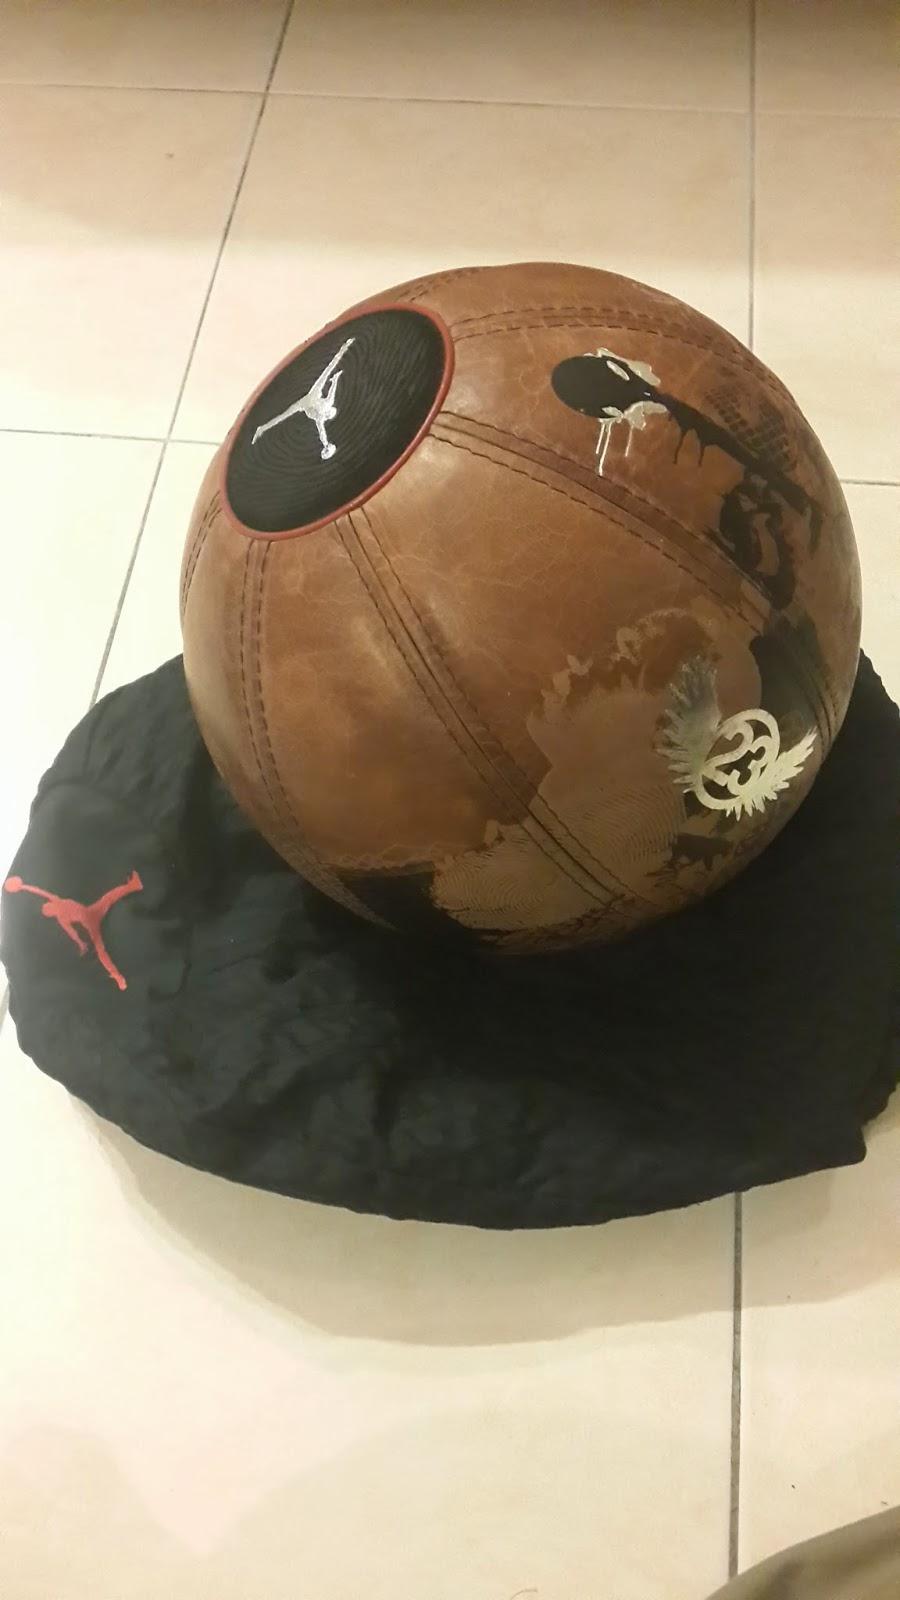 air jordan 23 basketball ball